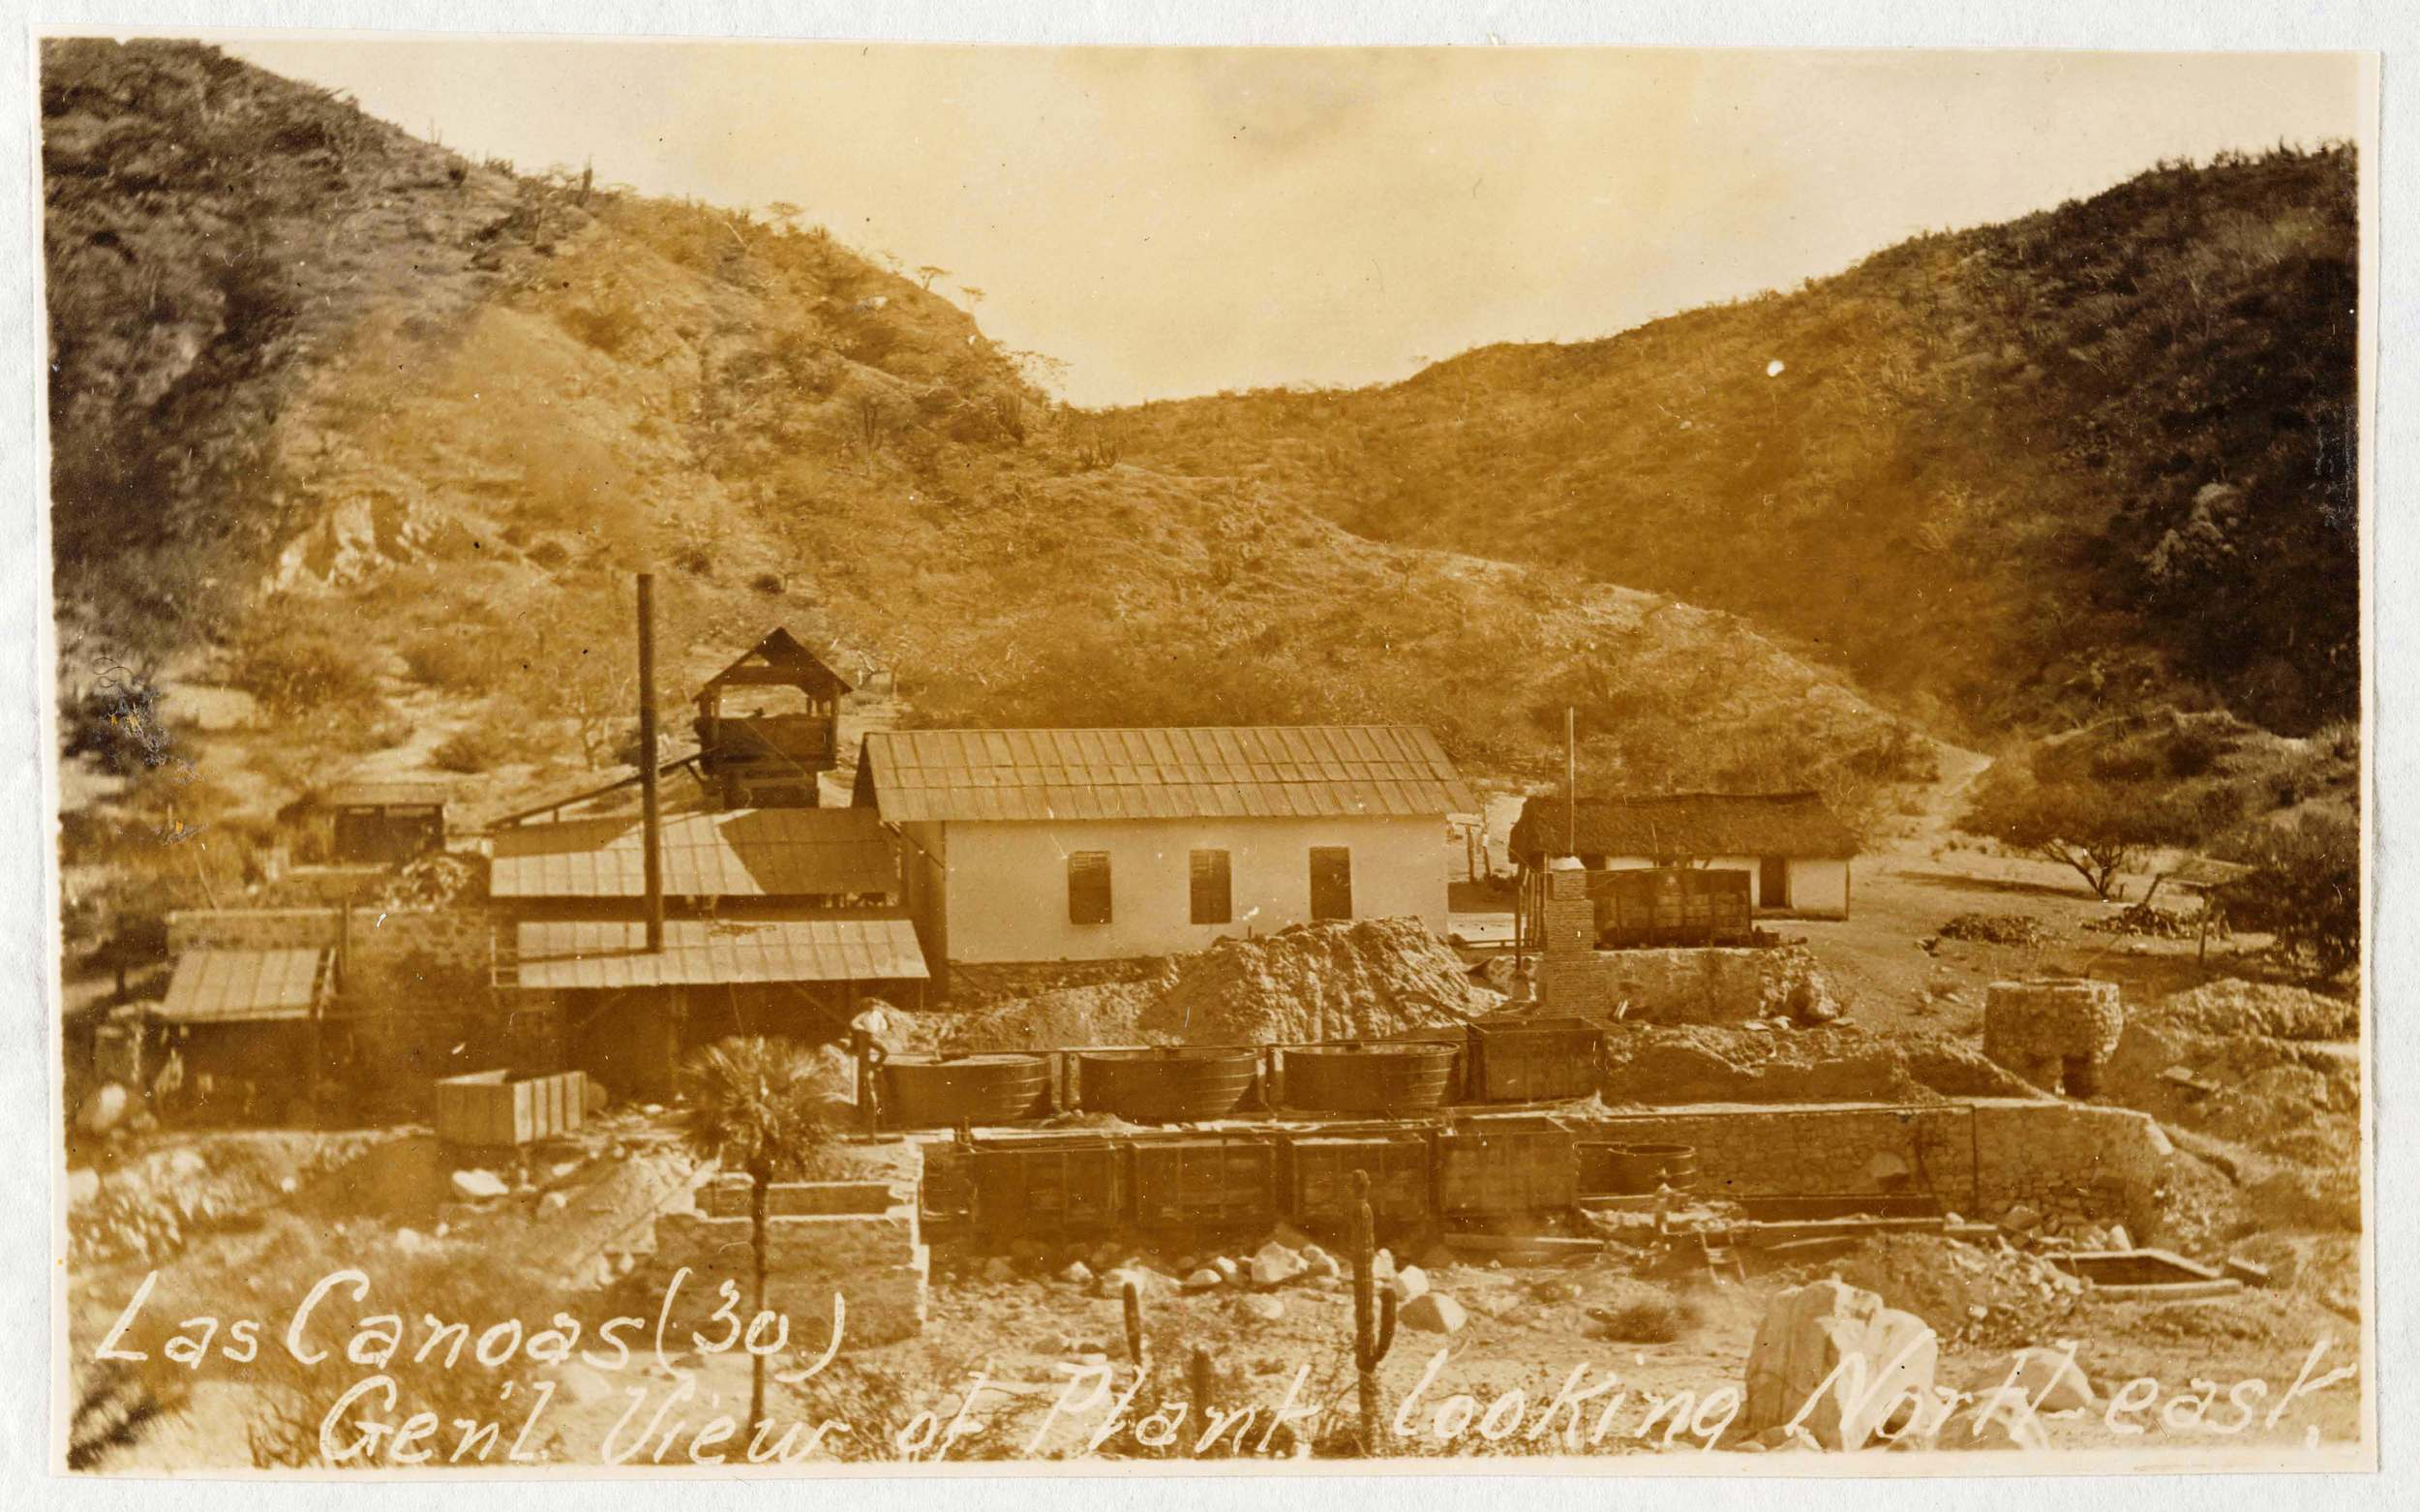 canoas-siglo-19-procesamiento-oro-bcs